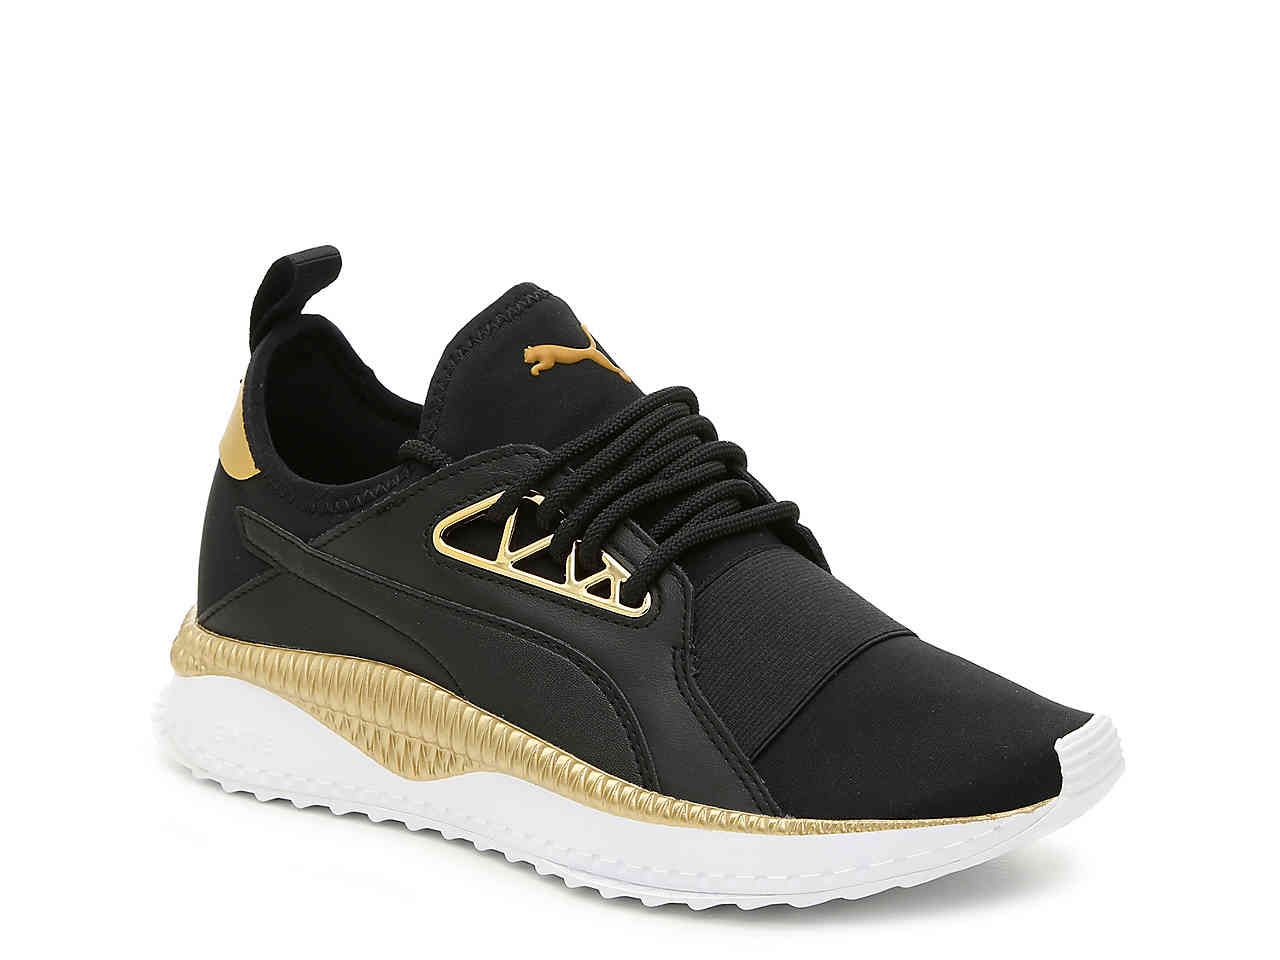 Puma Tsugi Apex Jewel Sneaker - Women's